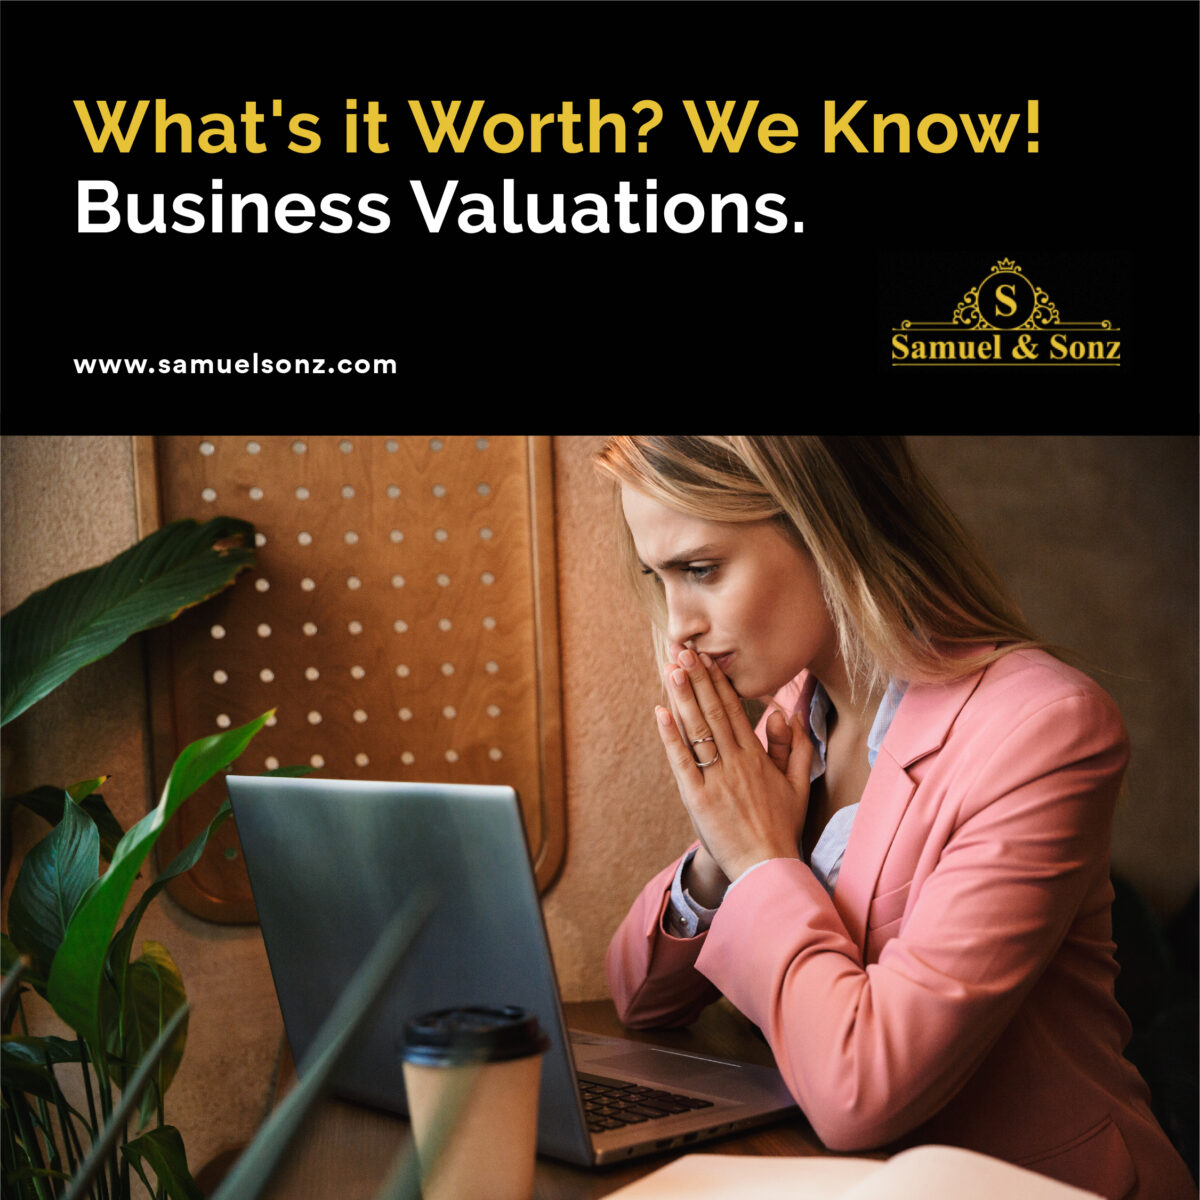 Sydney business valuation and advisory